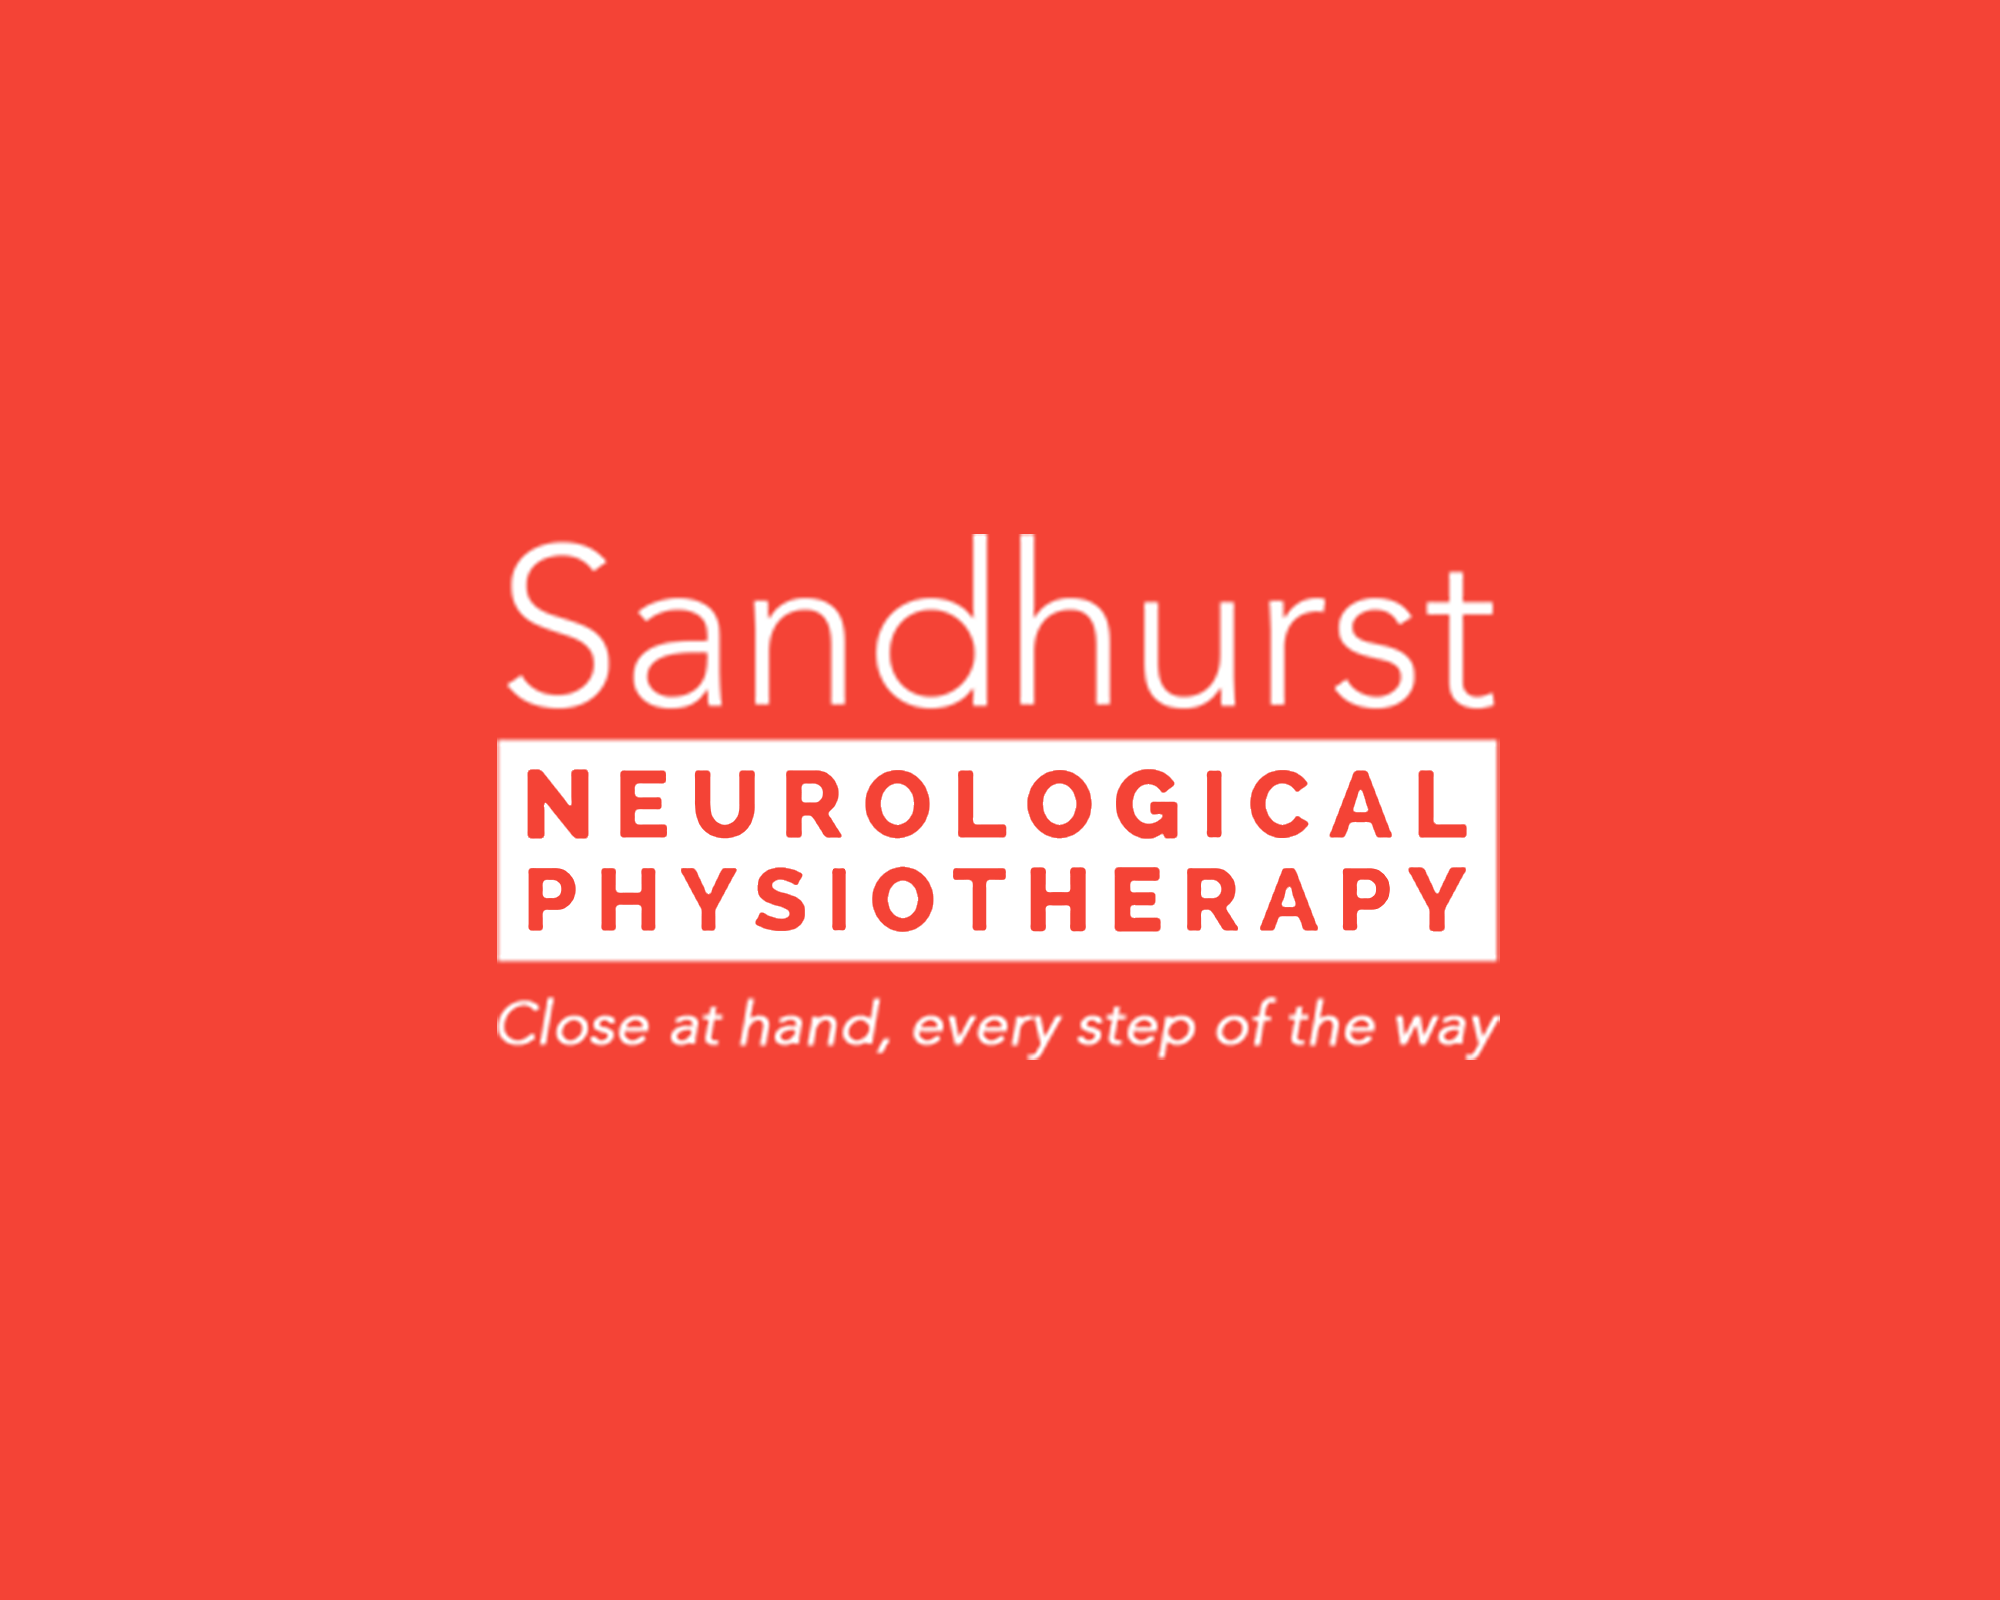 sandhurst neurological physiotherapy Logo